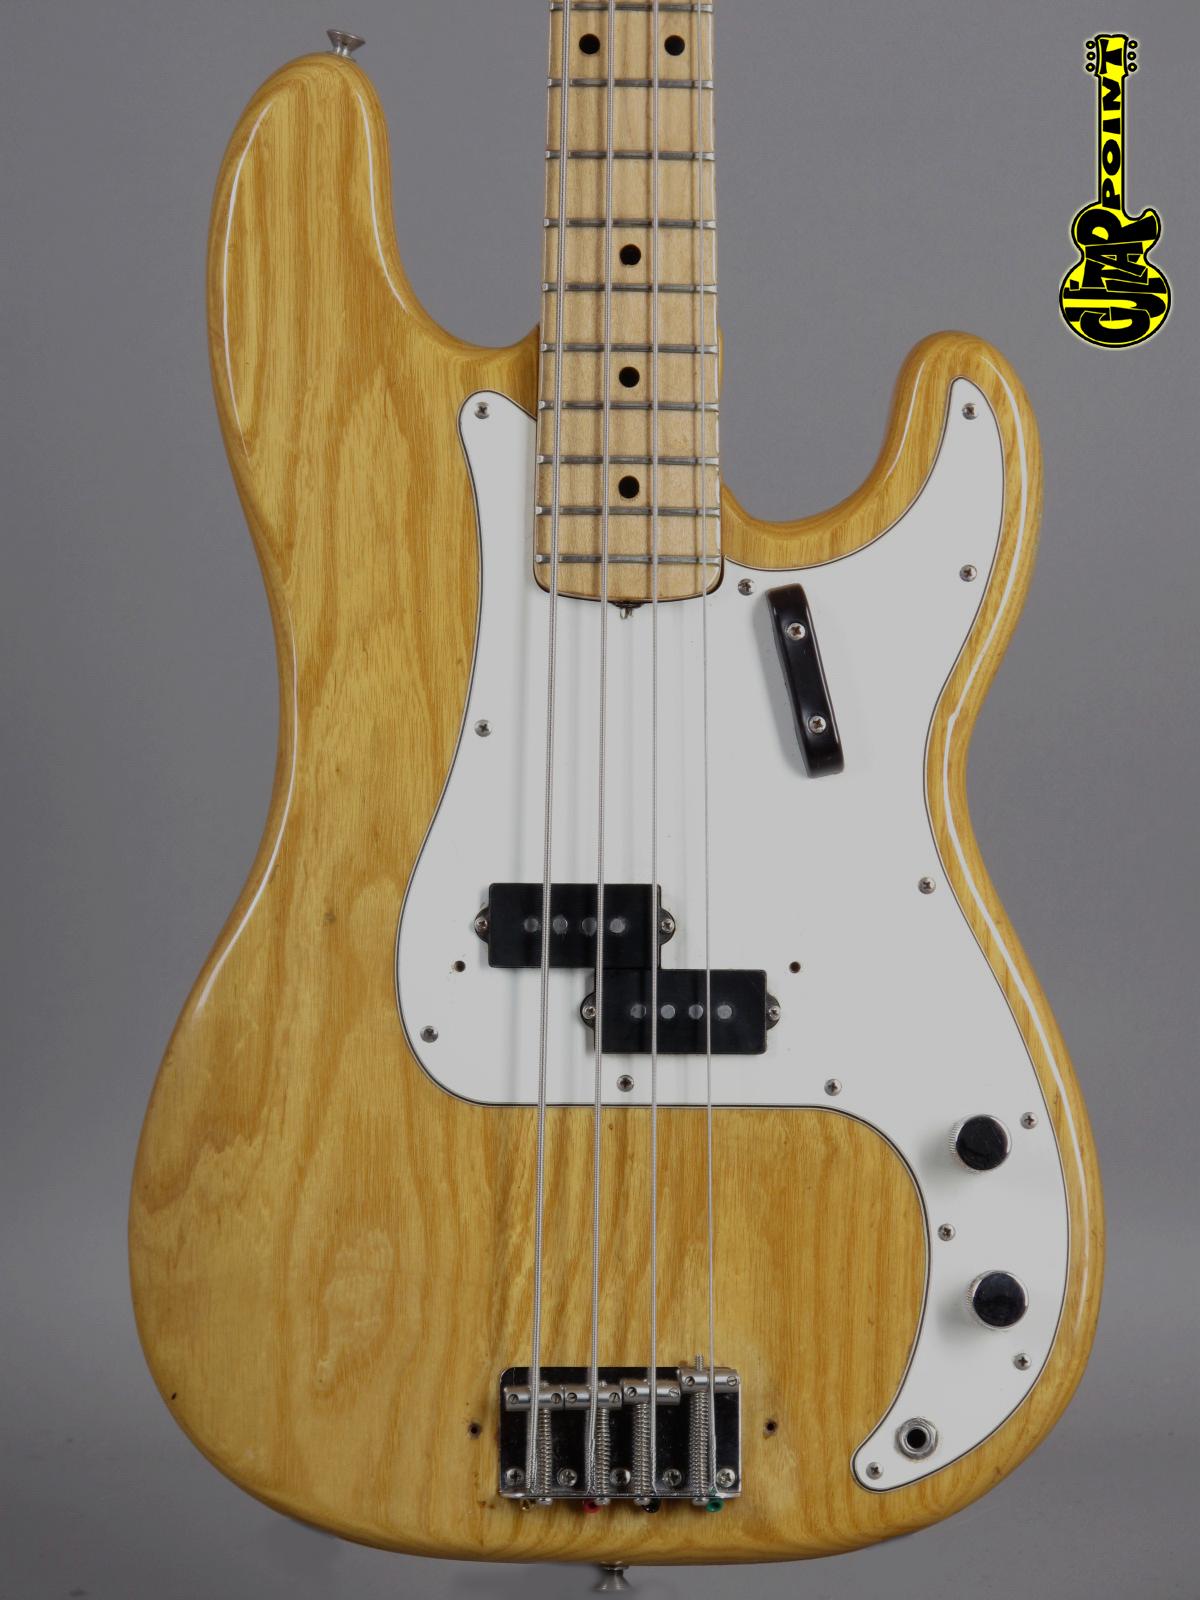 1972 Fender Precision Bass - Natural Ash